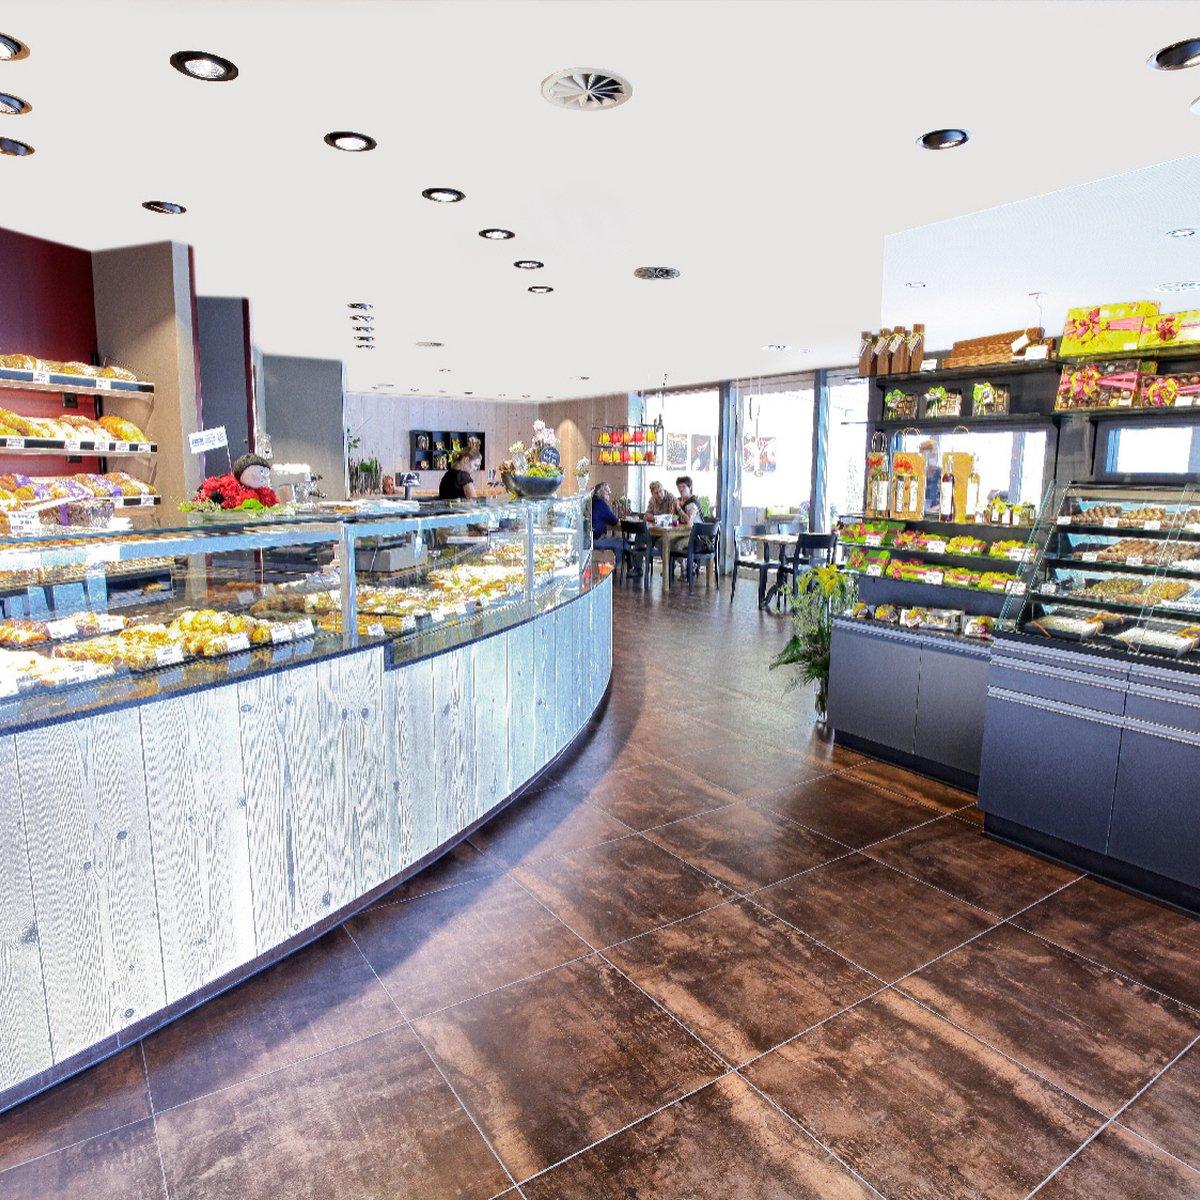 Laden-Café Innen